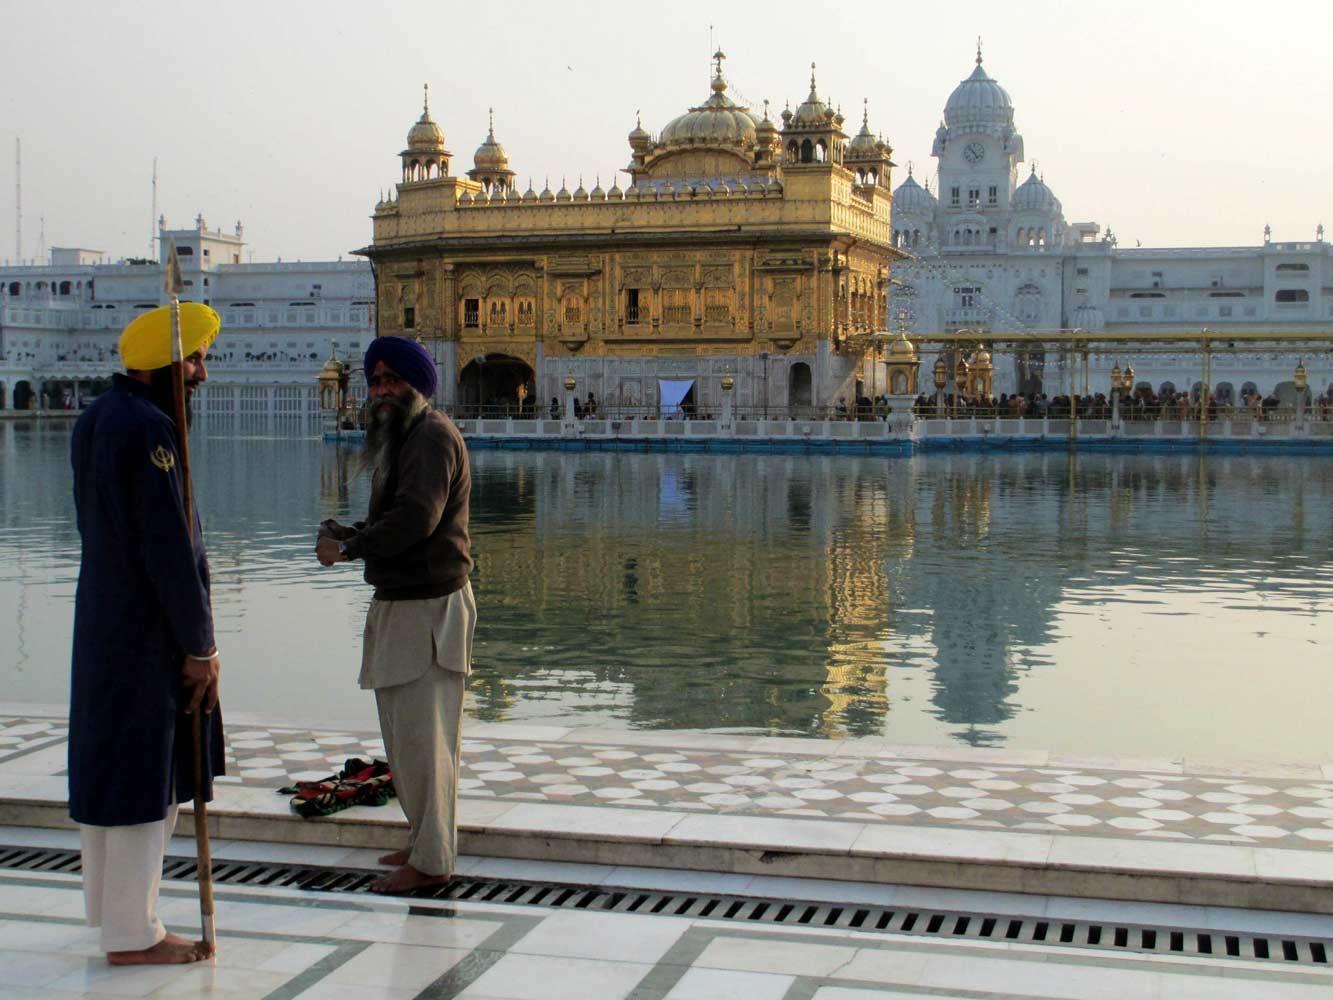 India-Amritsar-2-3000kmViajes-Aventura-Alternativos-Mochilero-Turismo_Responsable